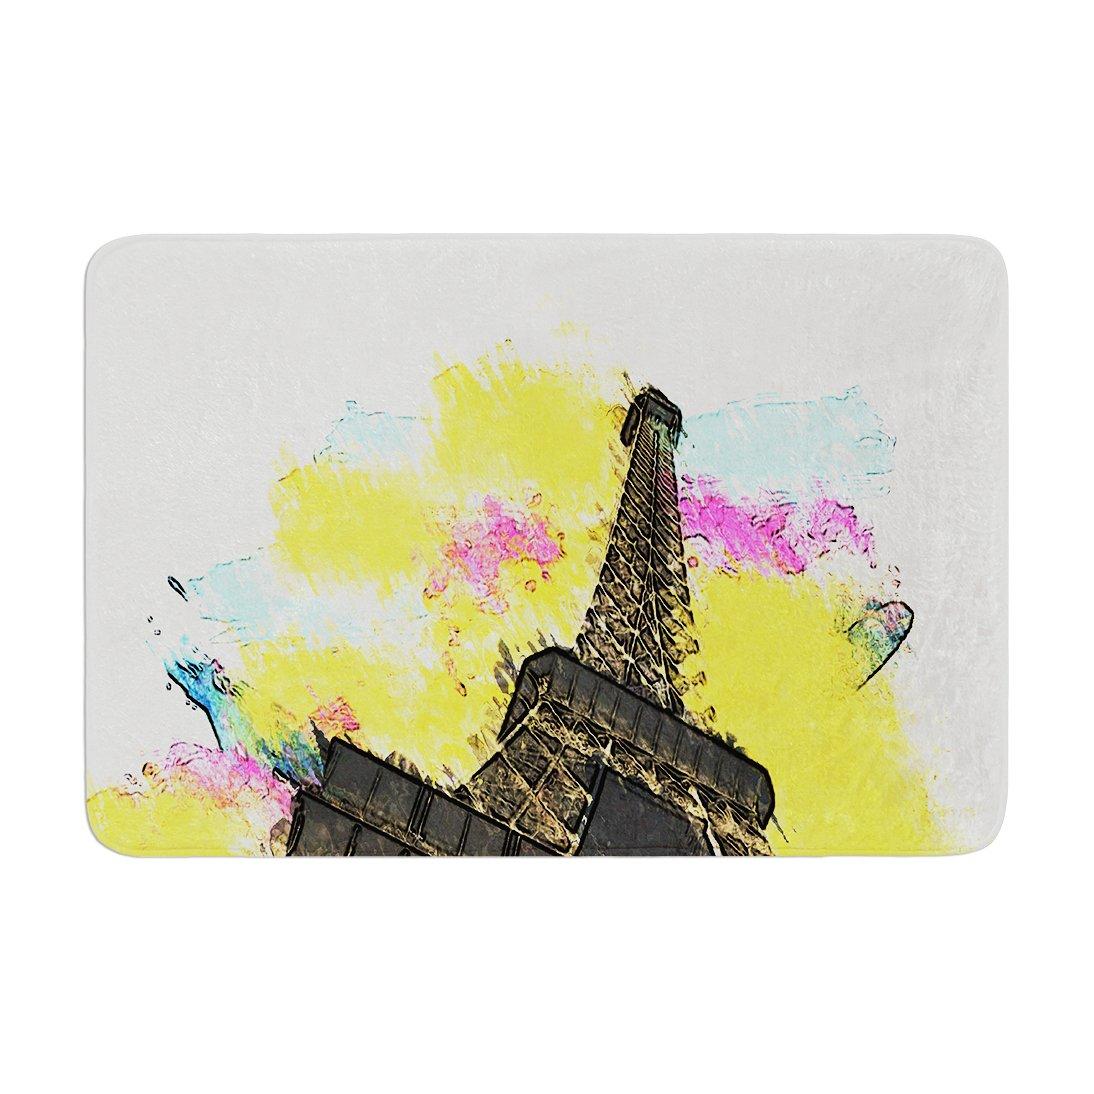 Kess InHouse Oriana Cordero Eifel Bon Jour Yellow Paris Memory Foam Bath Mat 17 by 24